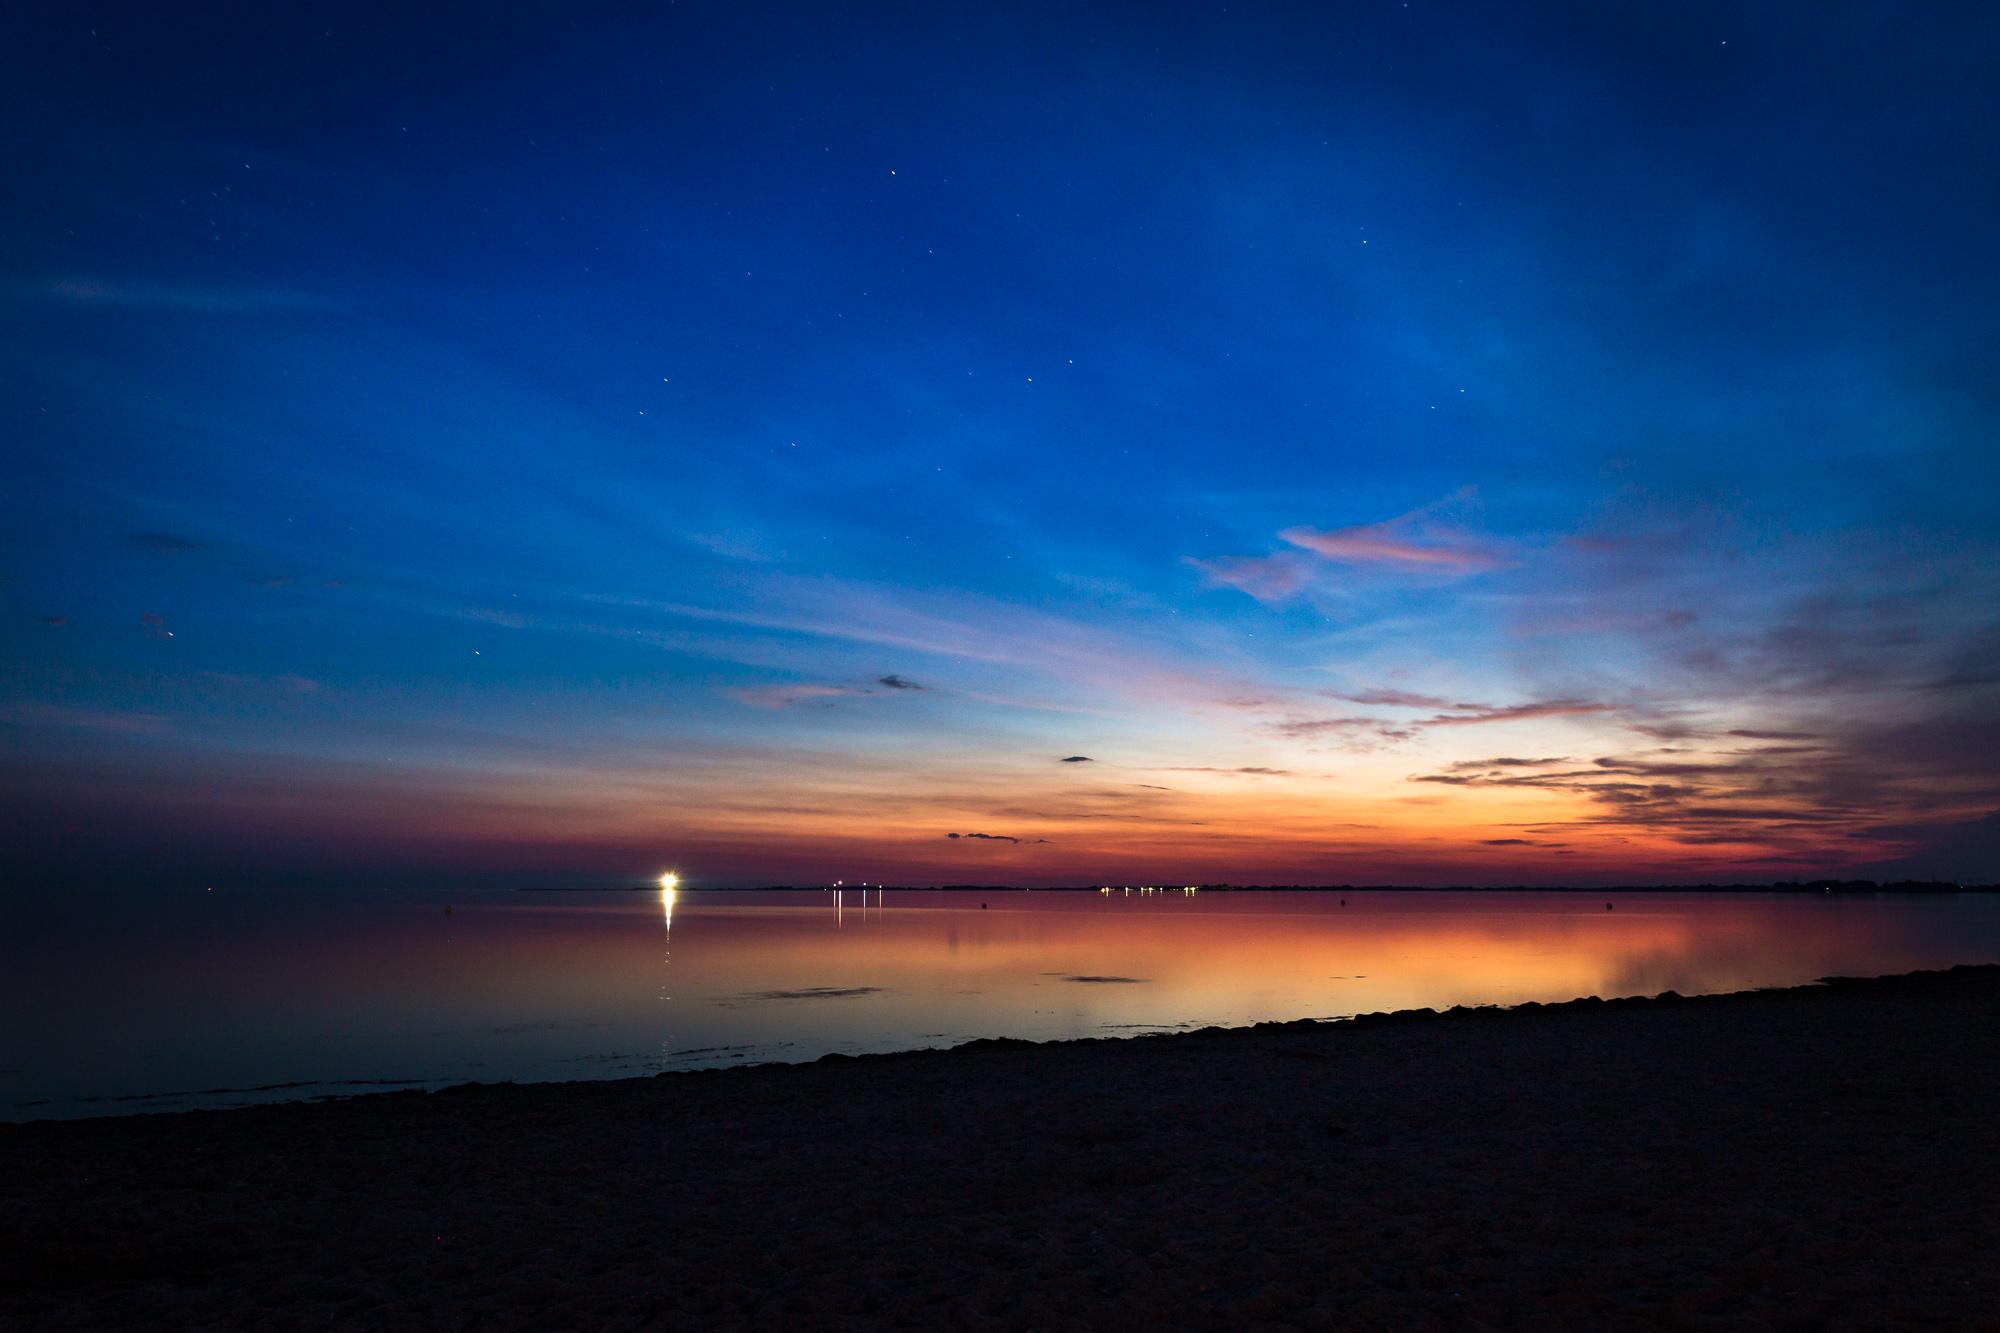 Sonnenuntergang Strukkamp